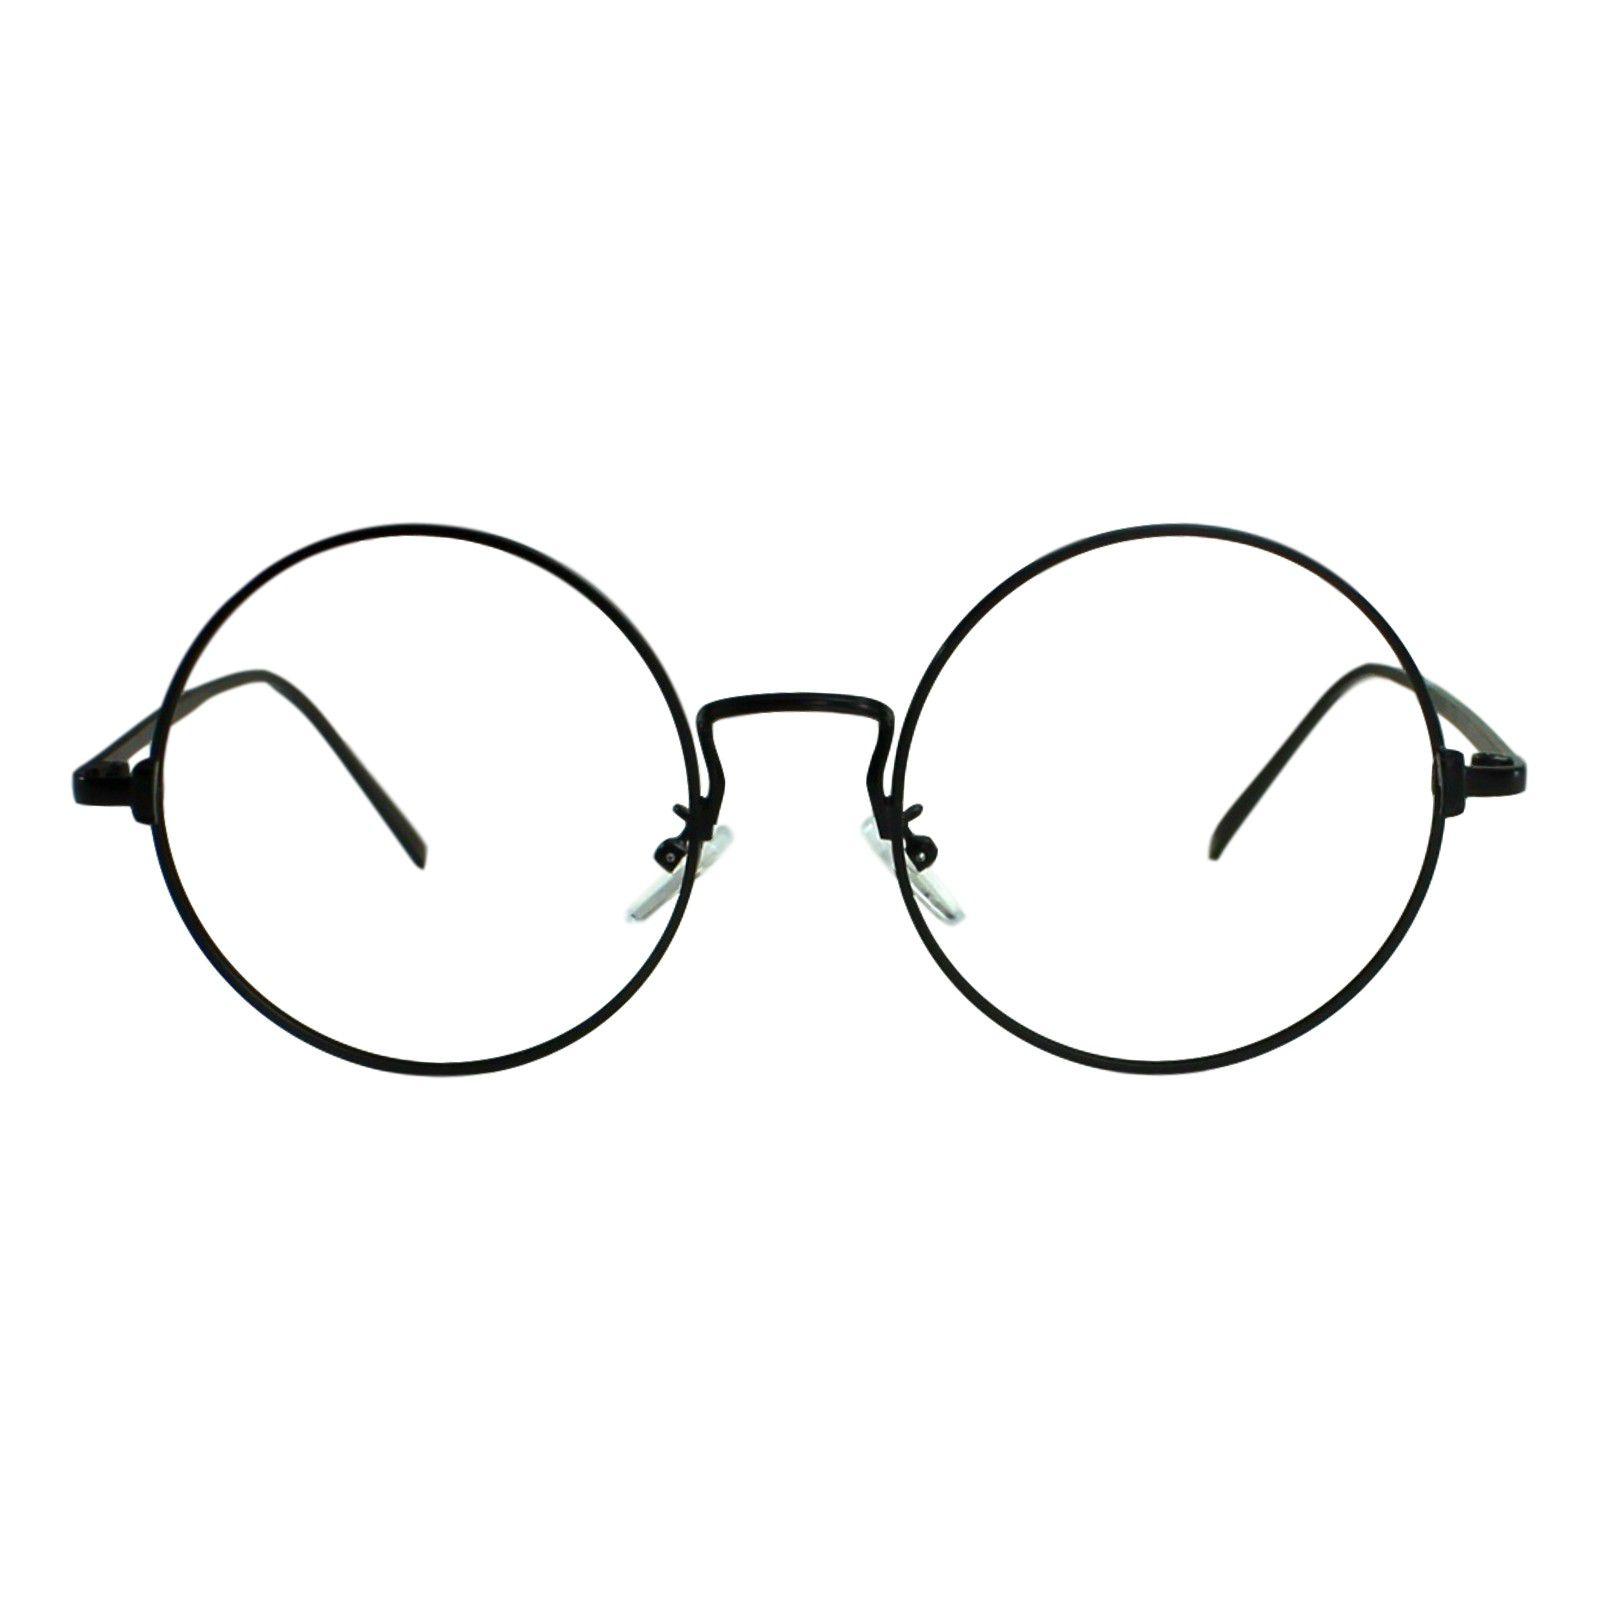 ... Armação para Óculos Díspar D1881 Redondo Grande Preto - Díspar Style ... 7b8b15cd6b